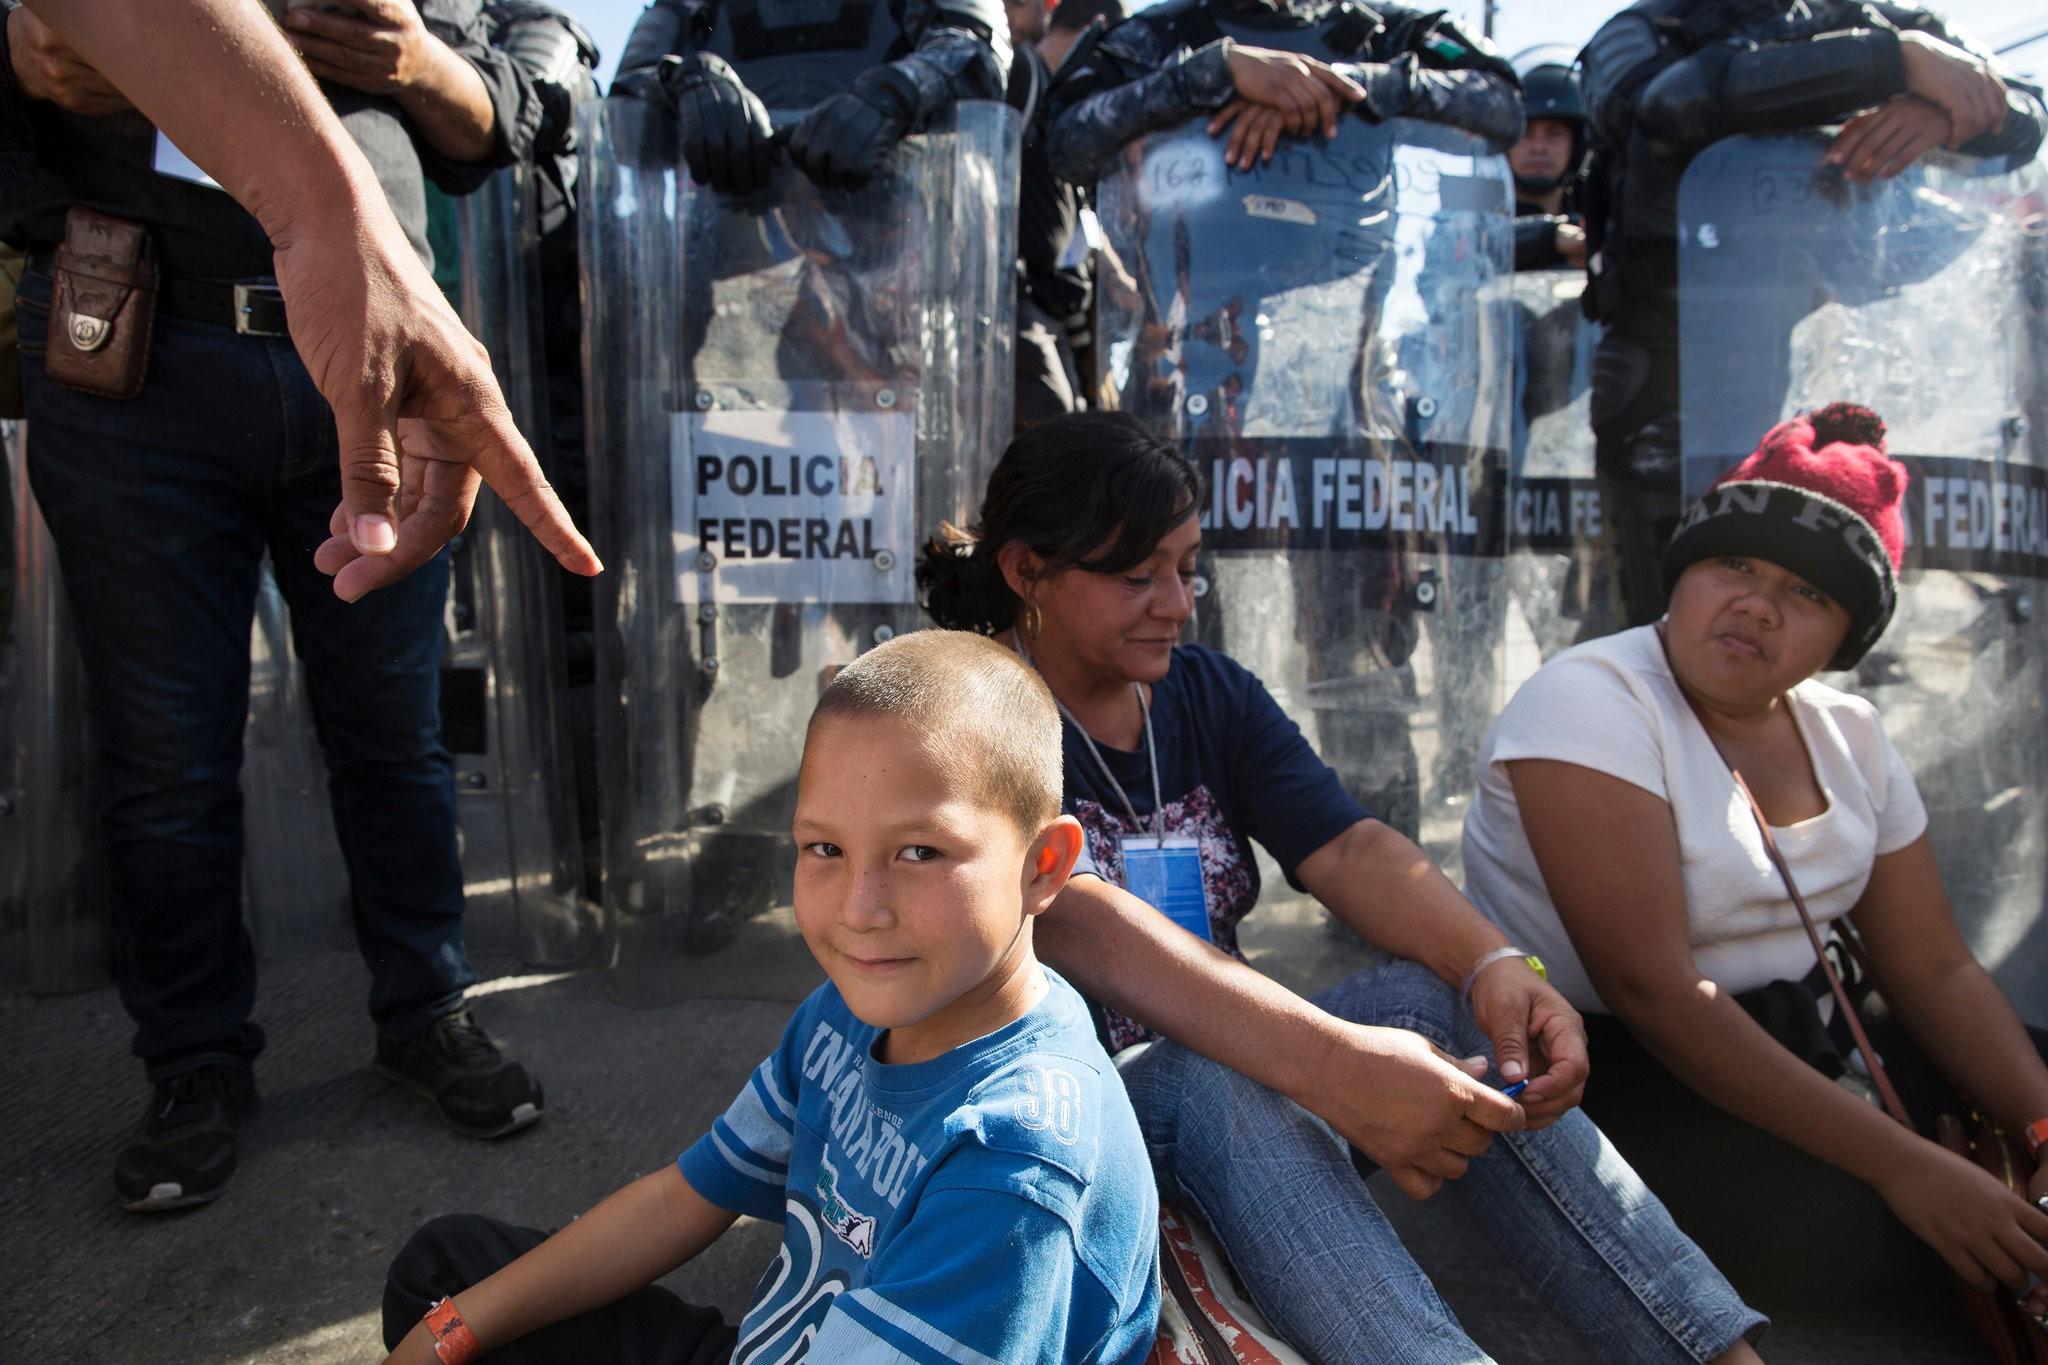 South American Migrants, Caravan, Central American Migrants, Immigration Policy, U.S. Immigration Policy, Mexican Caravan, KOLUMN Magazine, KOLUMN, KINDR'D Magazine, KINDR'D, Willoughby Avenue